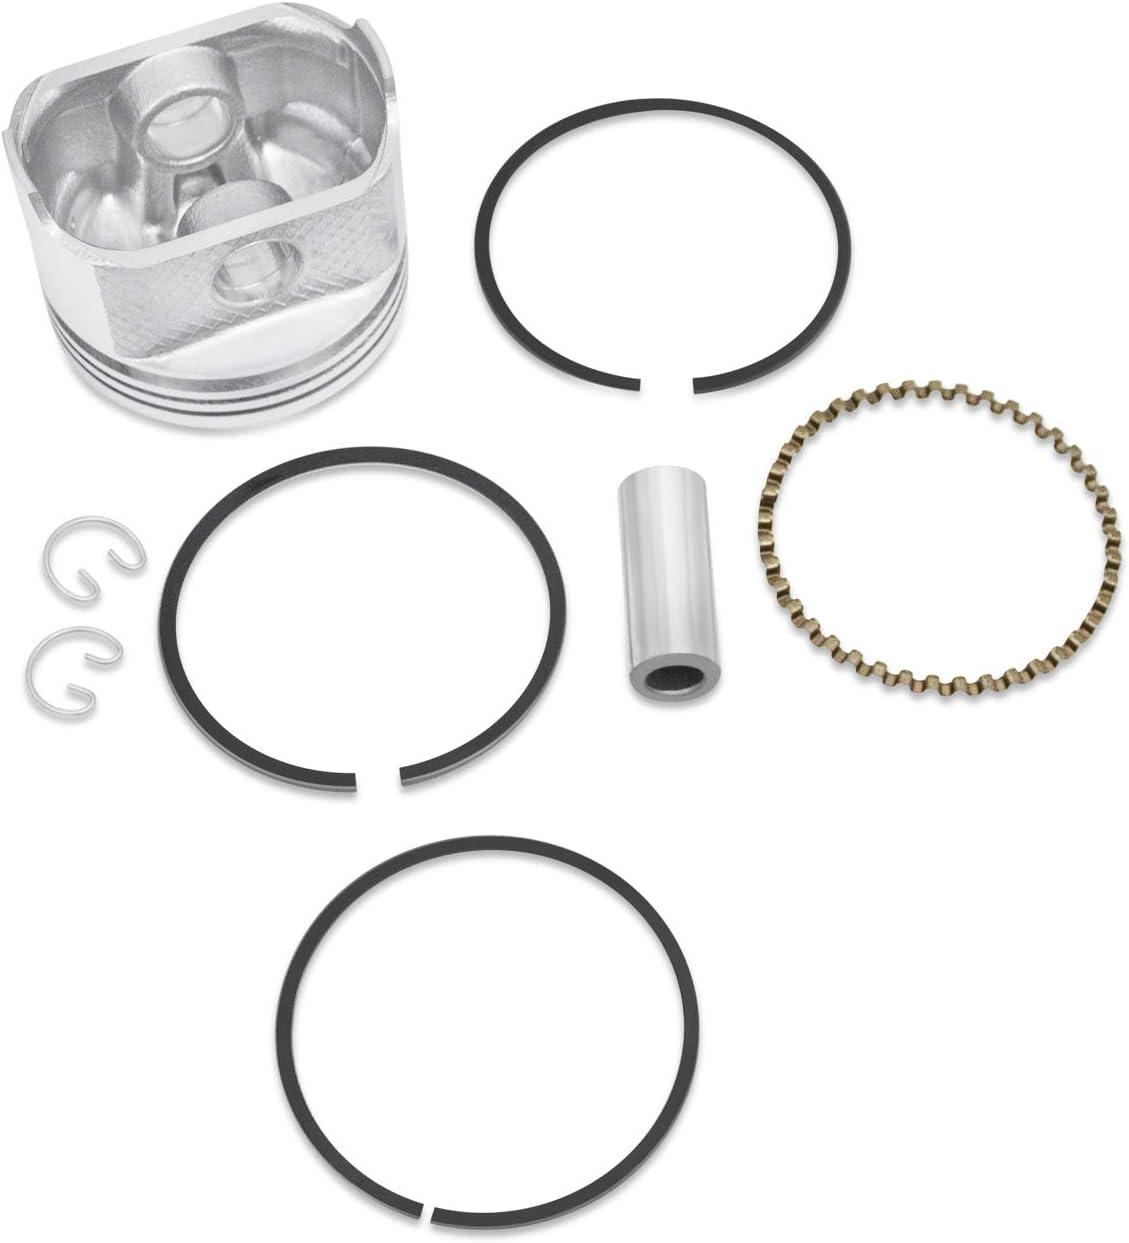 Everest Parts Supplies New 020 Piston Kit Fits Kohler K341 16HP Rings Circlips Wrist Pin